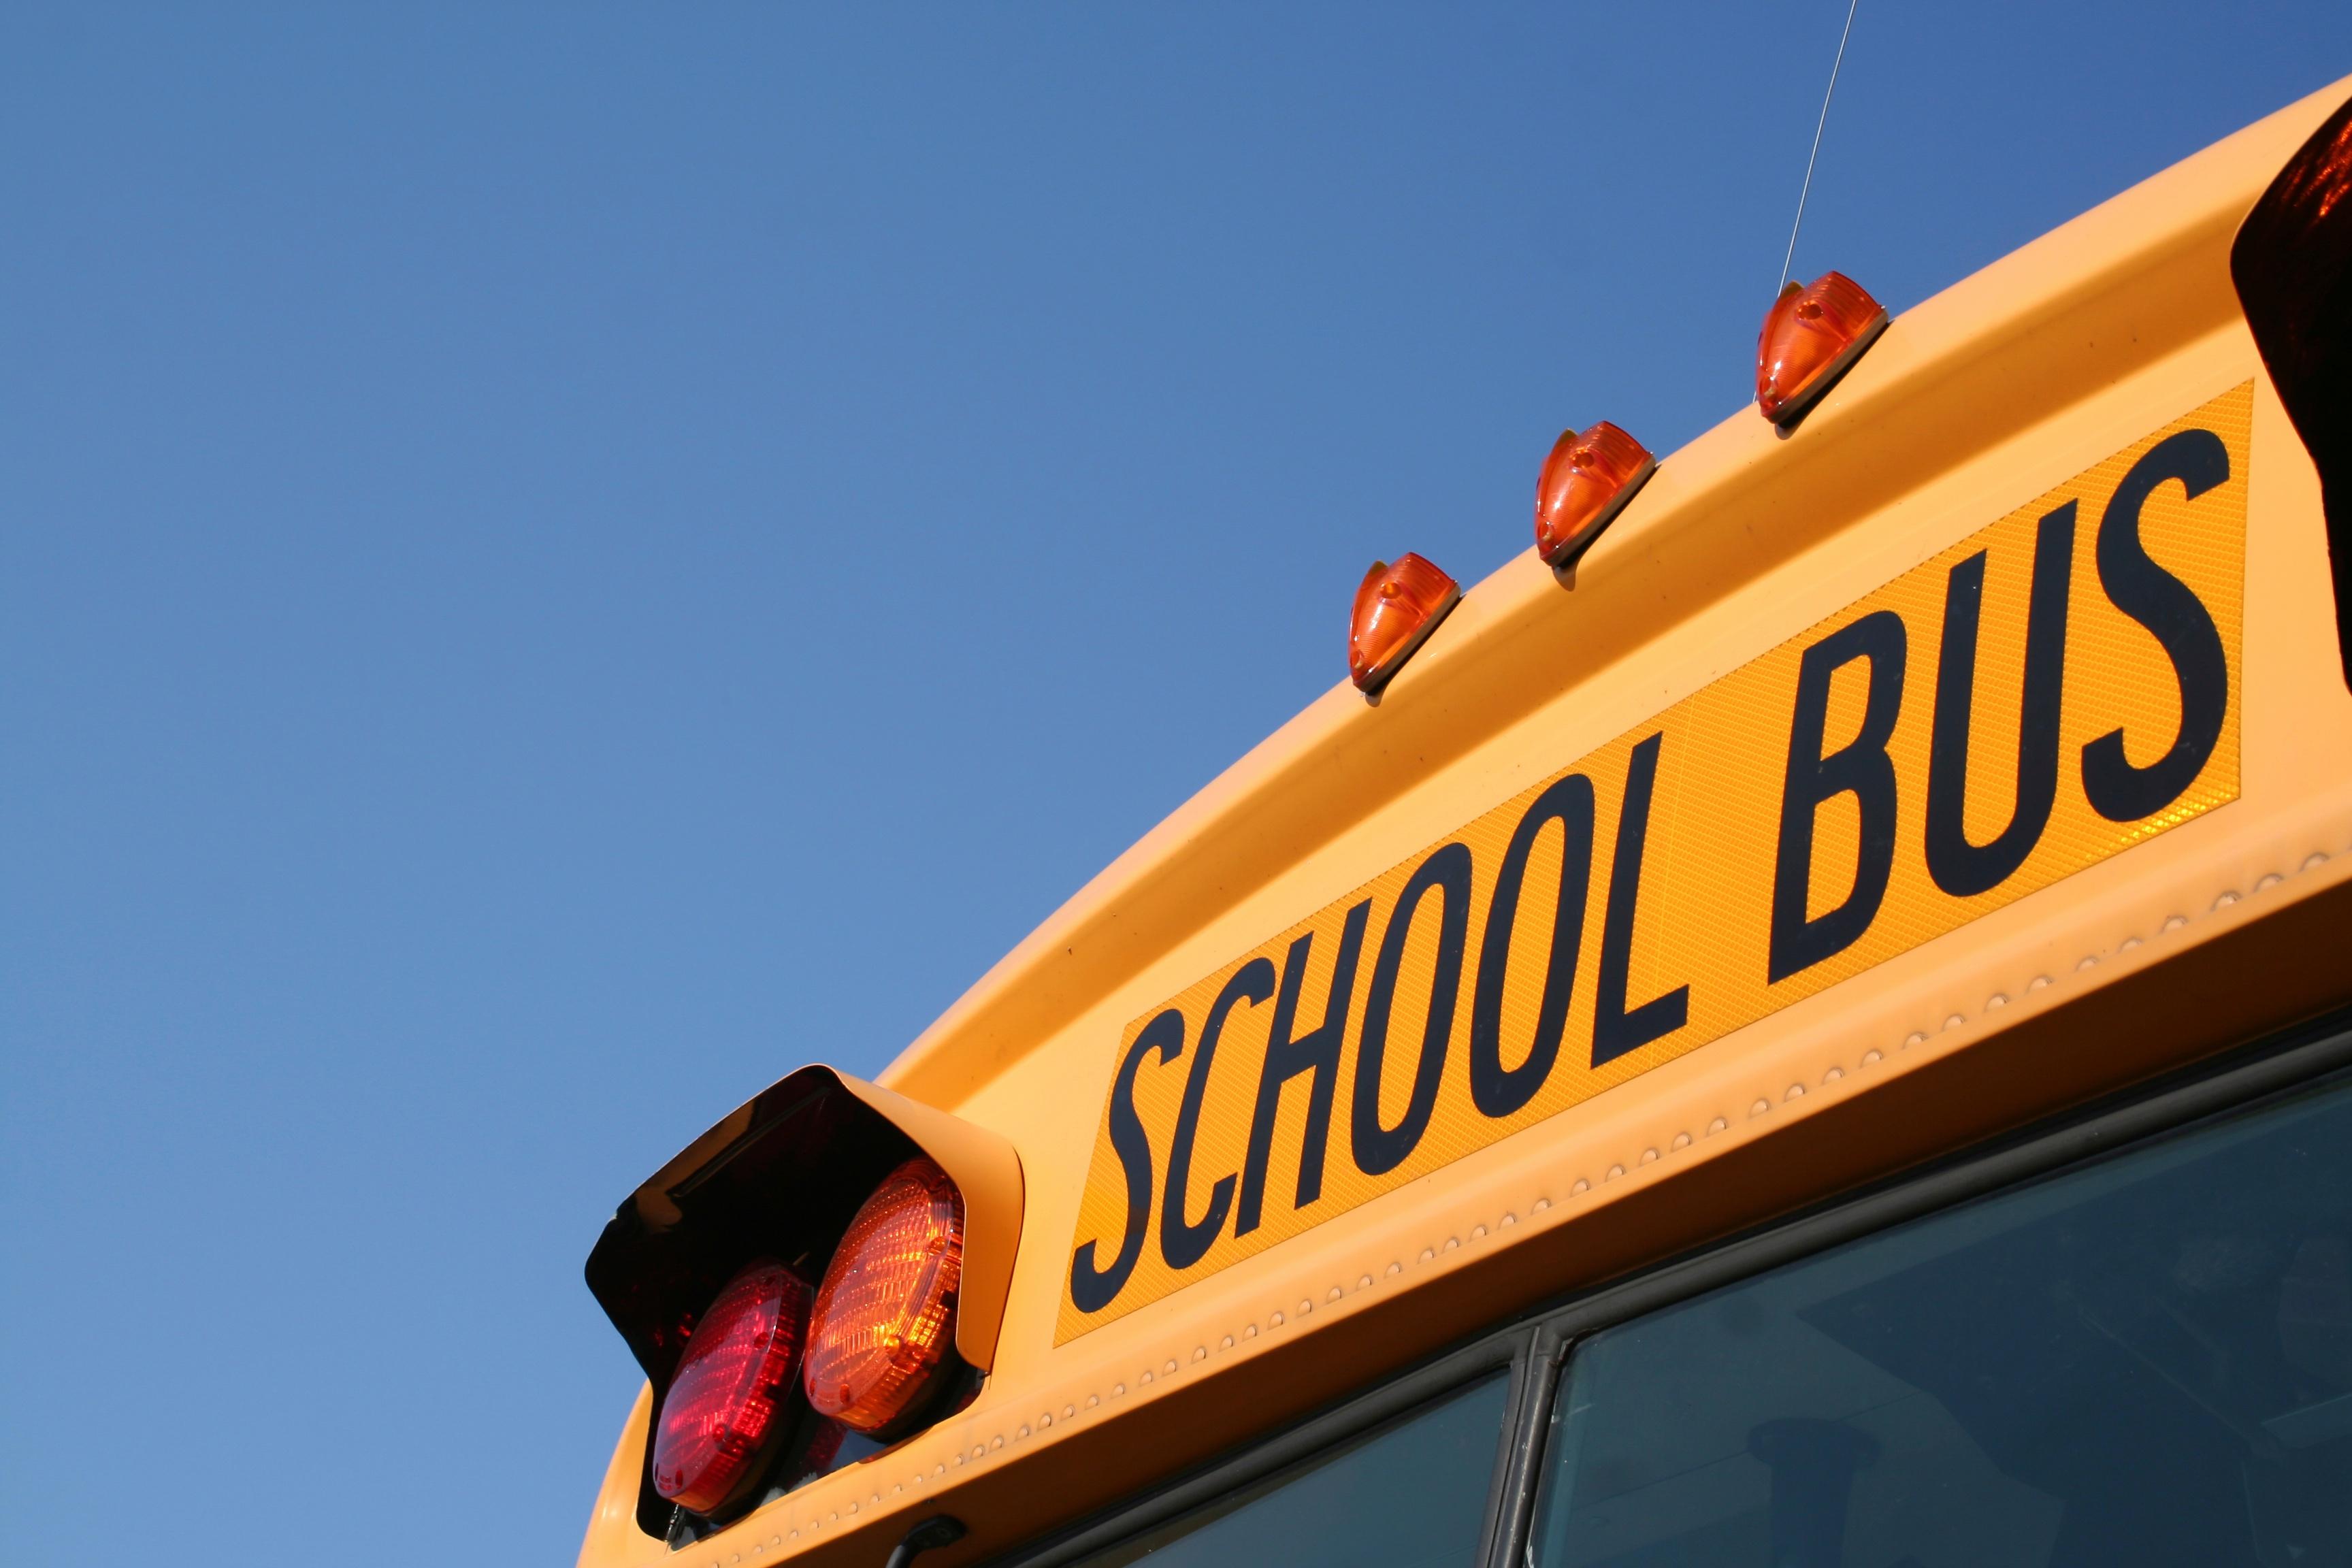 Bus_Image